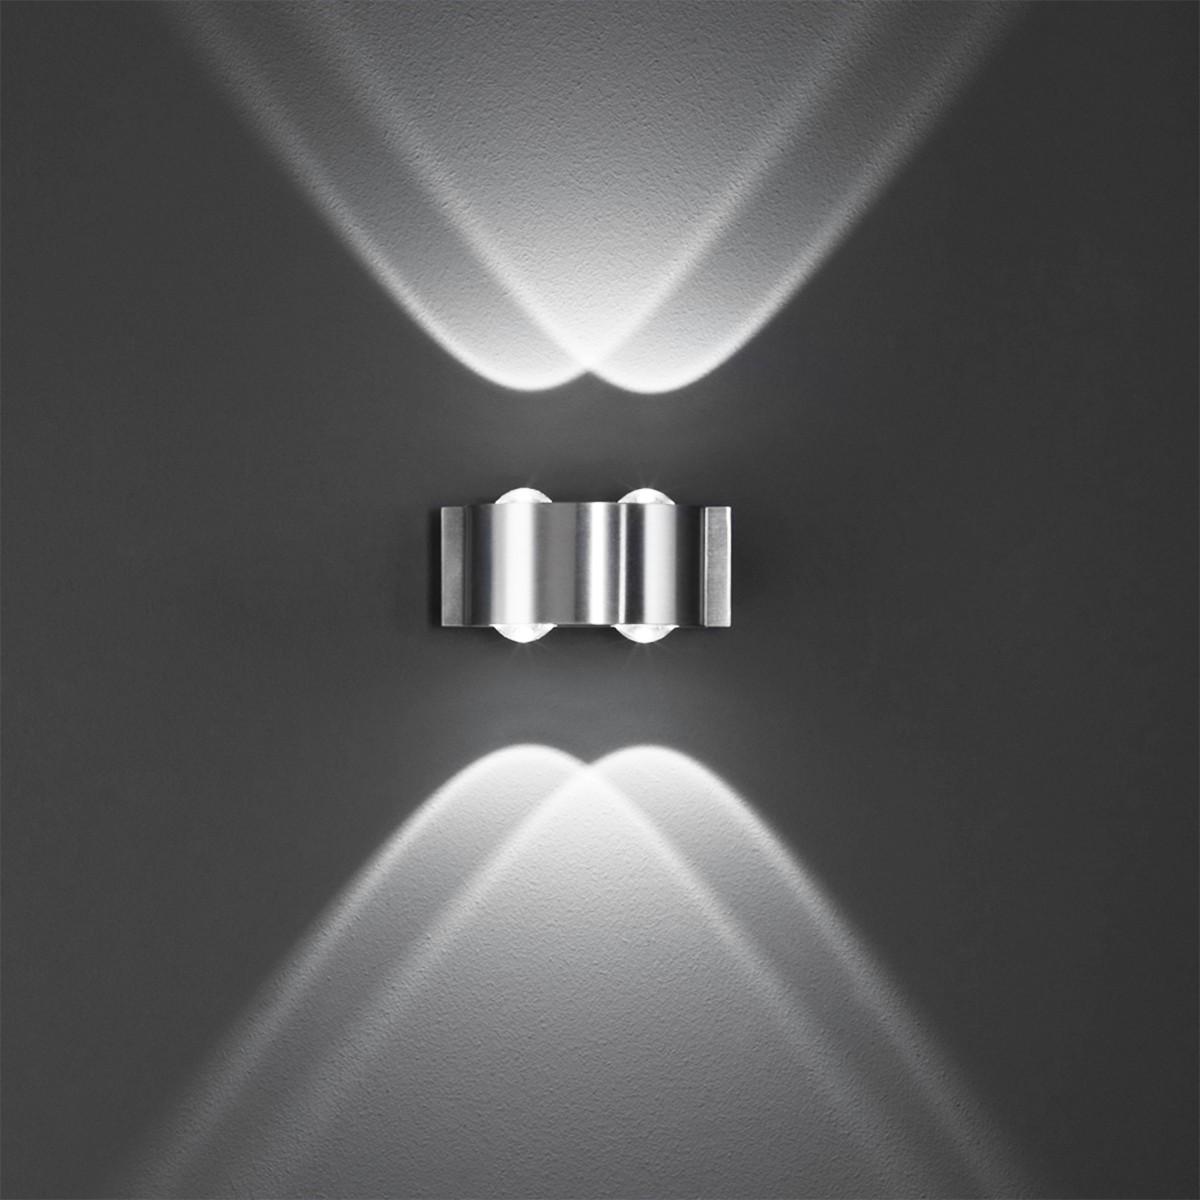 B-Leuchten Stream LED Wandleuchte, 4-flg., Aluminium